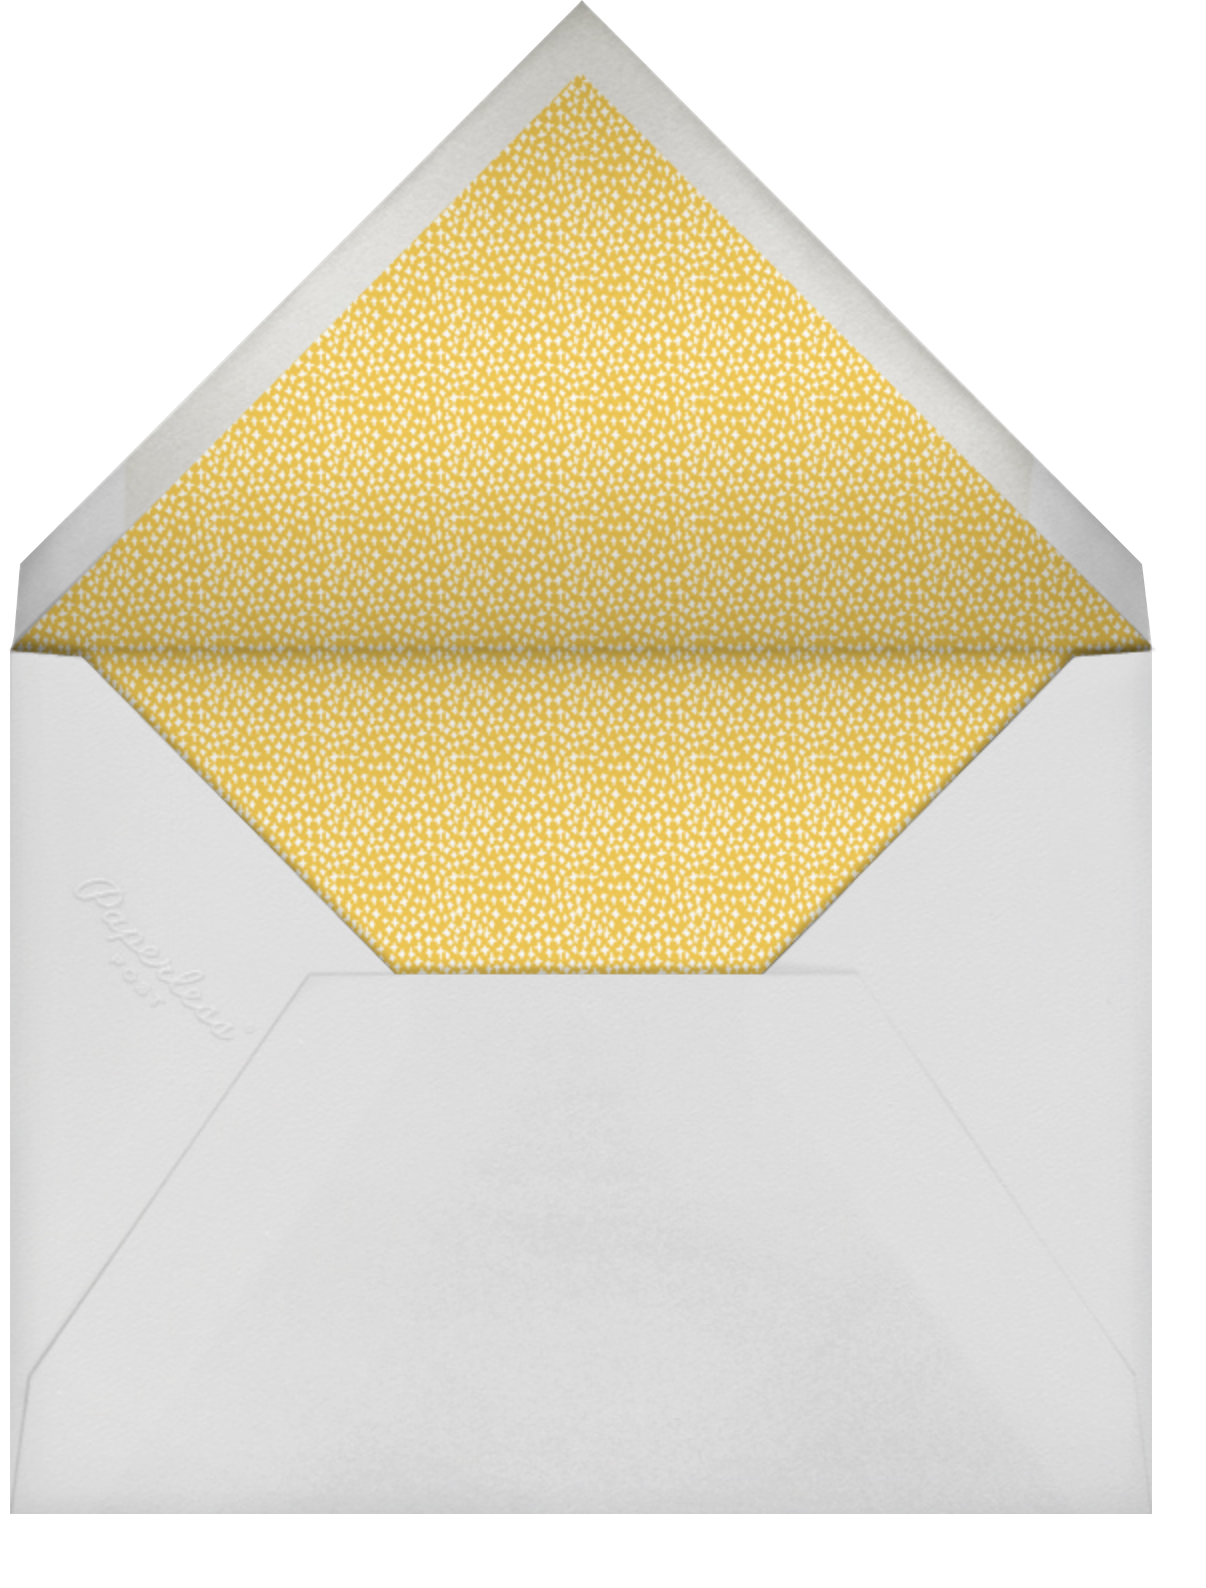 The Bee's Knees - Mr. Boddington's Studio - Valentine's Day - envelope back